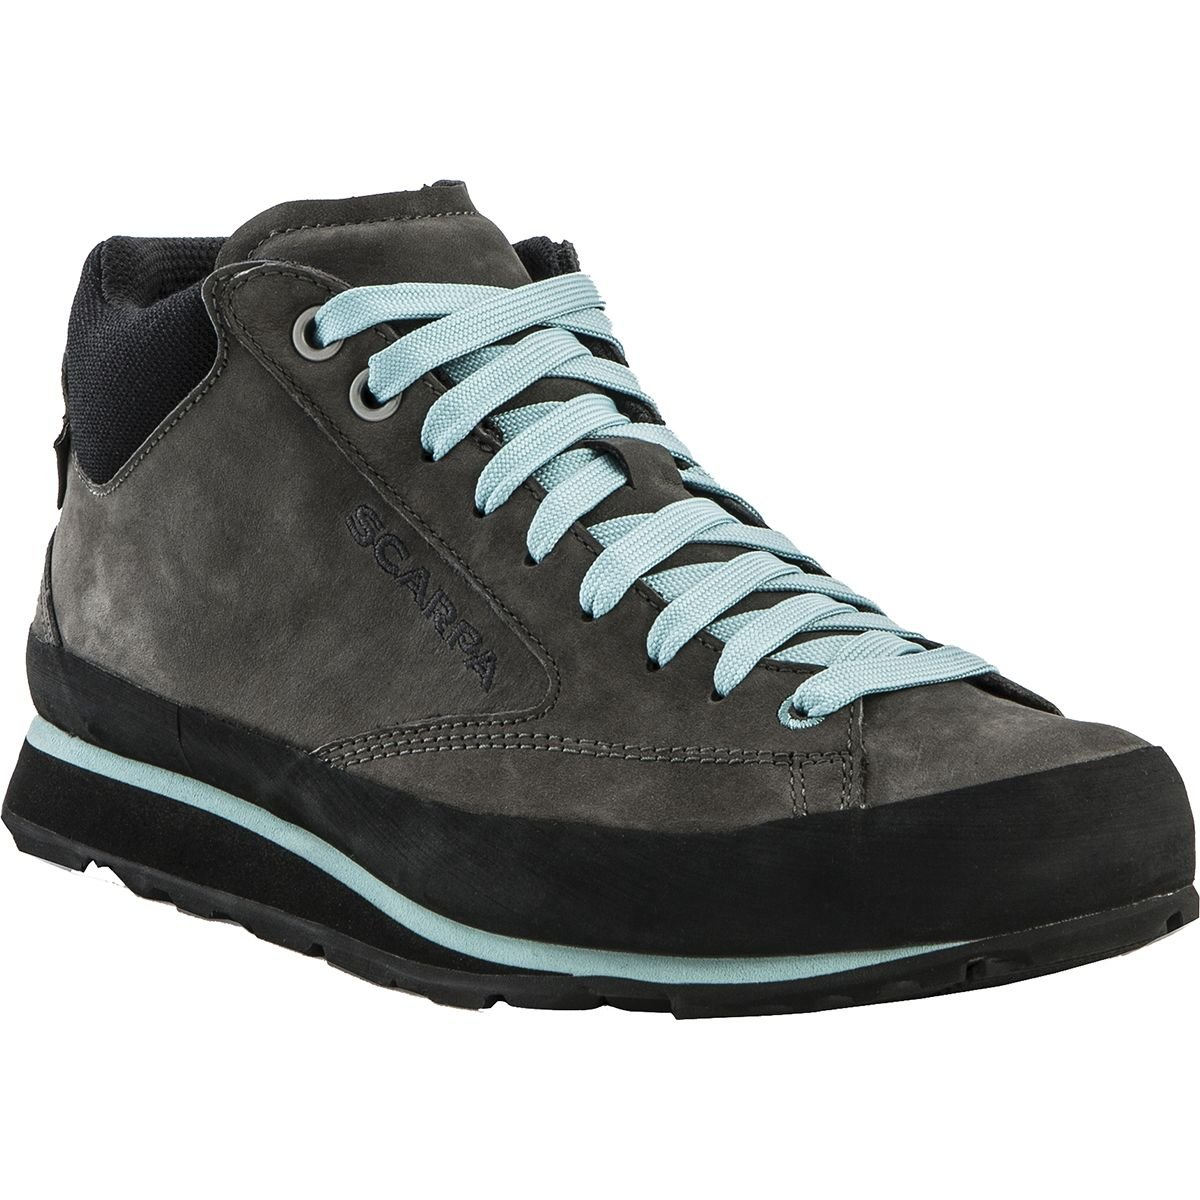 Scarpa Conifer GTX Shoe - Women's Graphite/Mineral Blue, 37.5 by SCARPA (Image #1)